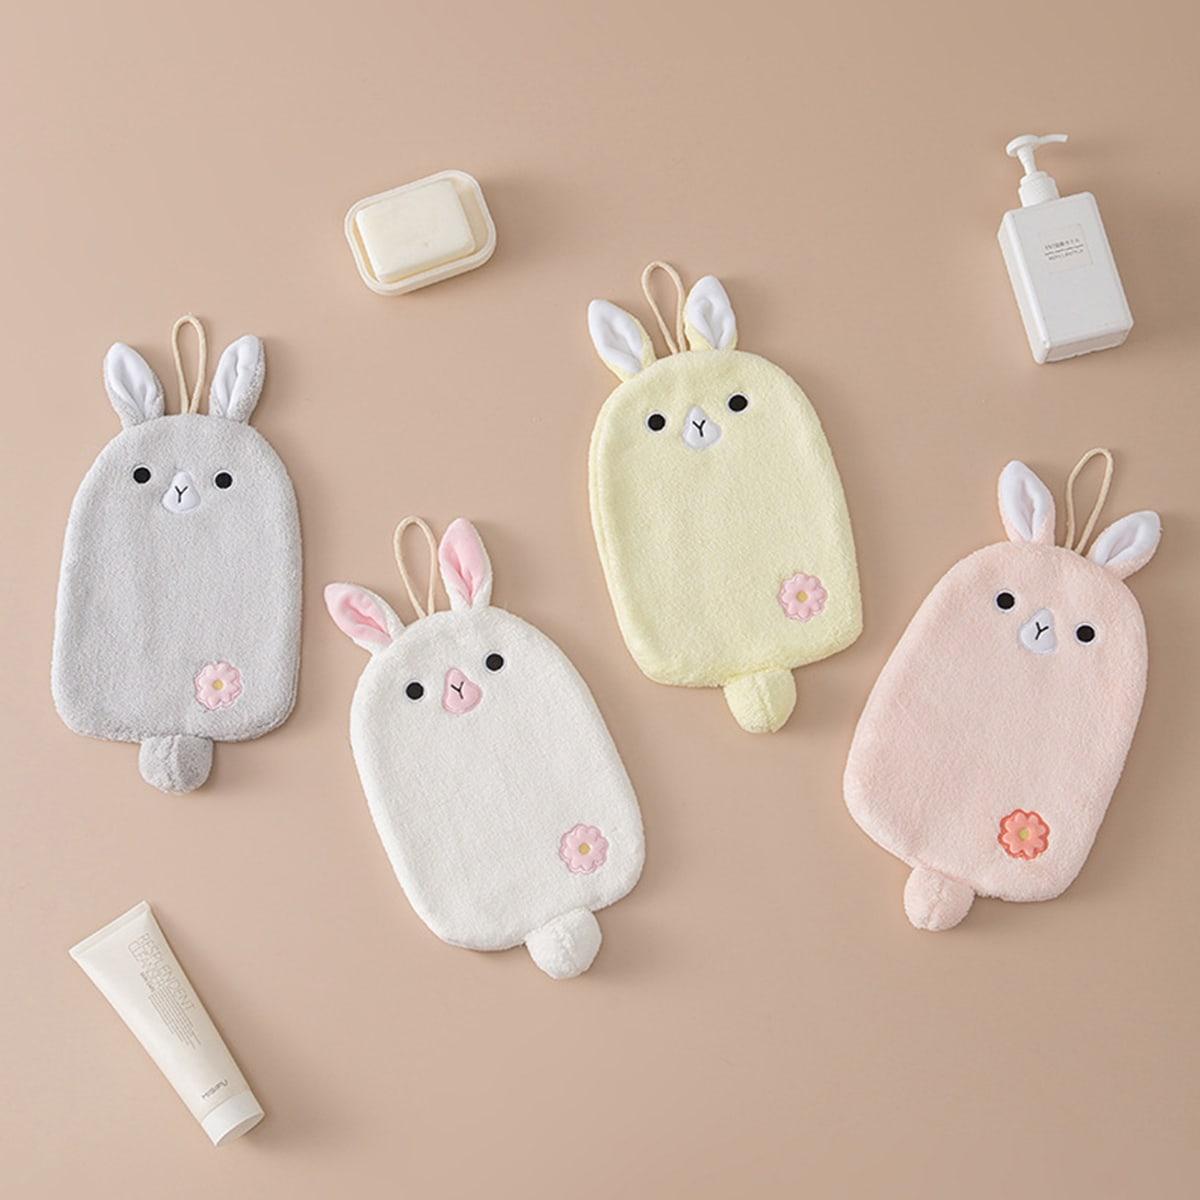 1Pc Rabbit Design Random Color Hand Towel